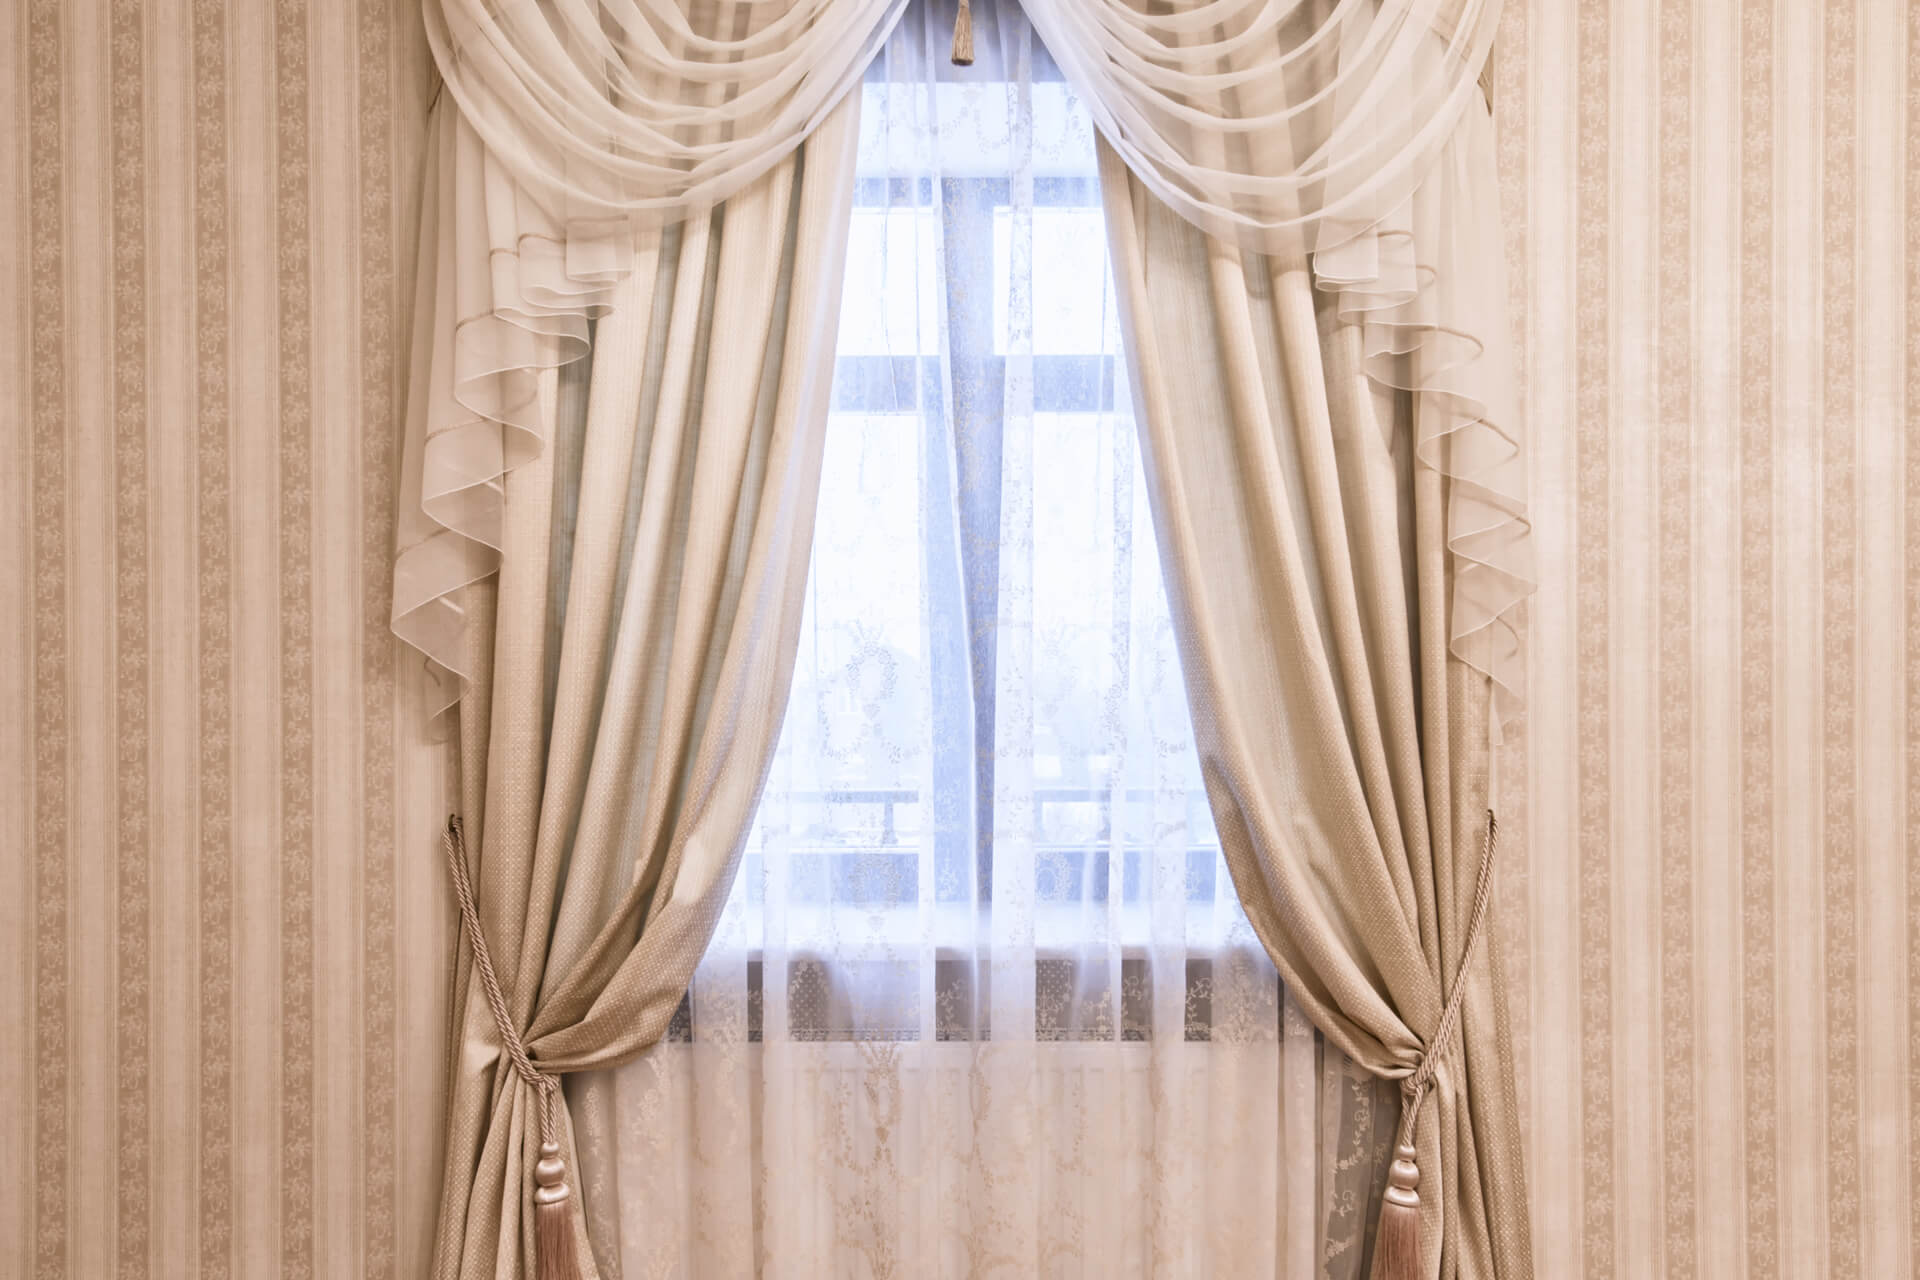 tendaggi-per-alberghi-e-strutture-ricettive-innamorati-tessuti